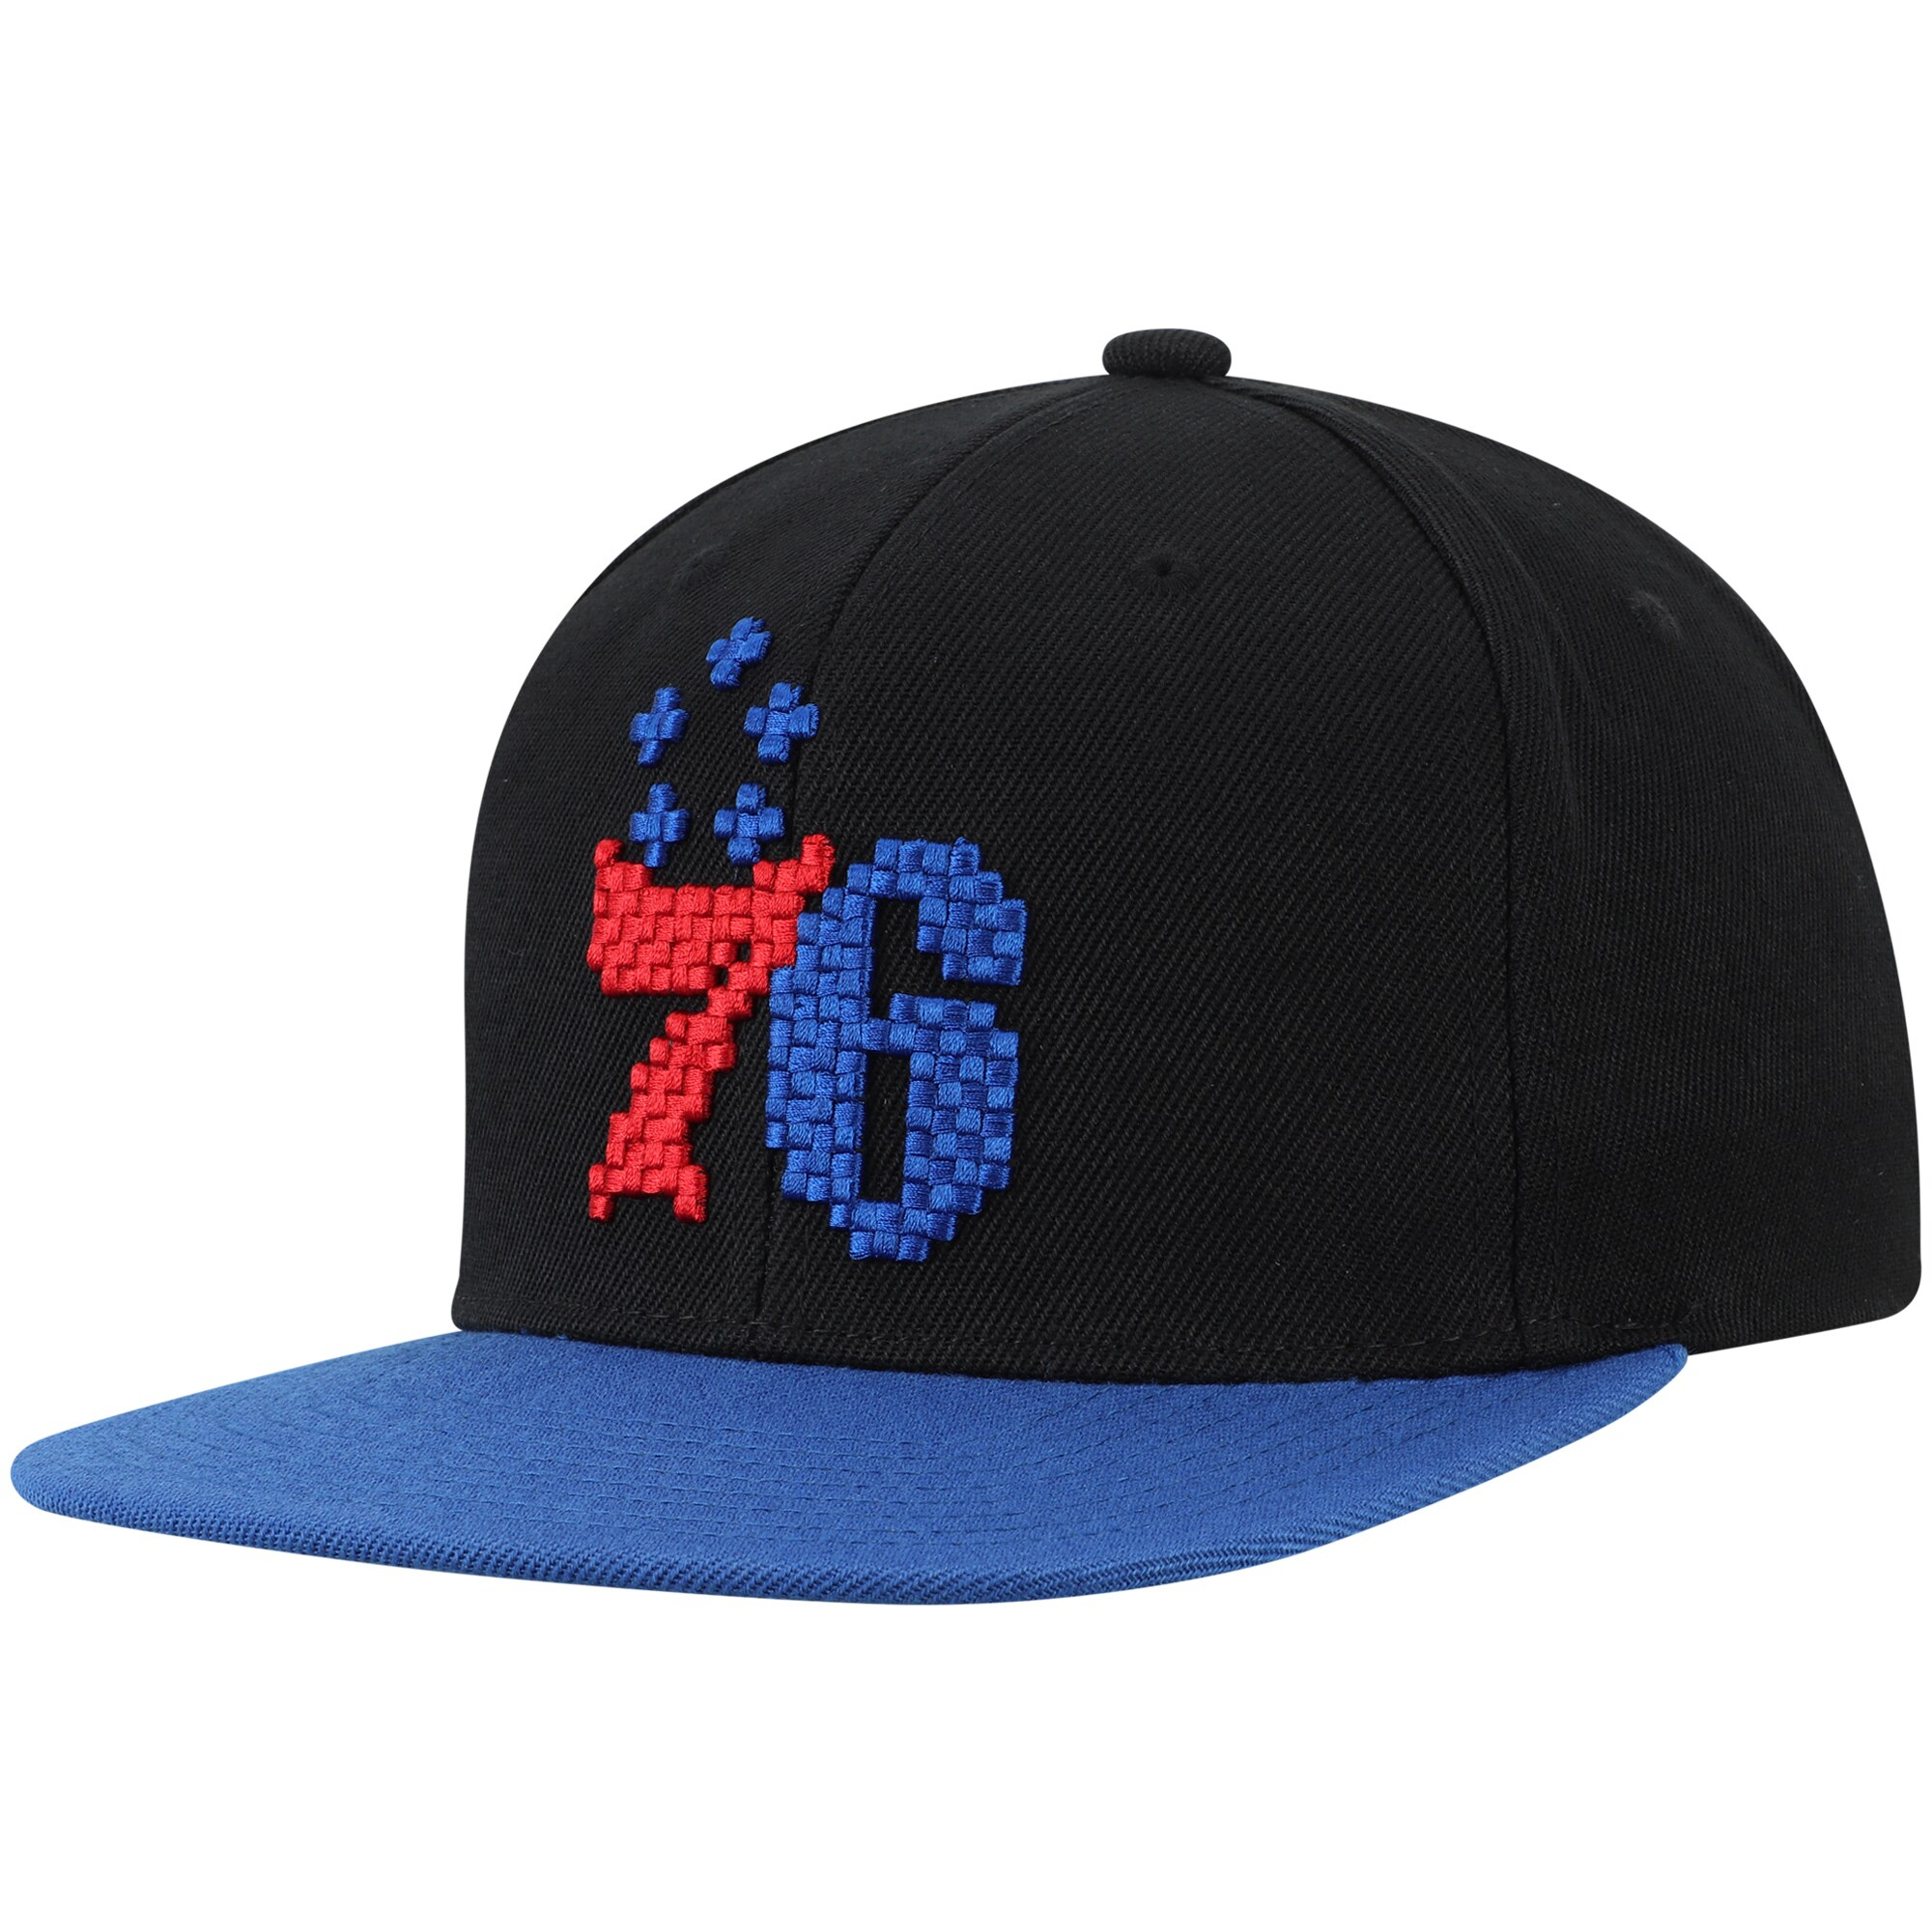 Philadelphia 76ers Mitchell & Ness 8-Bit Two-Tone Adjustable Snapback Hat - Black